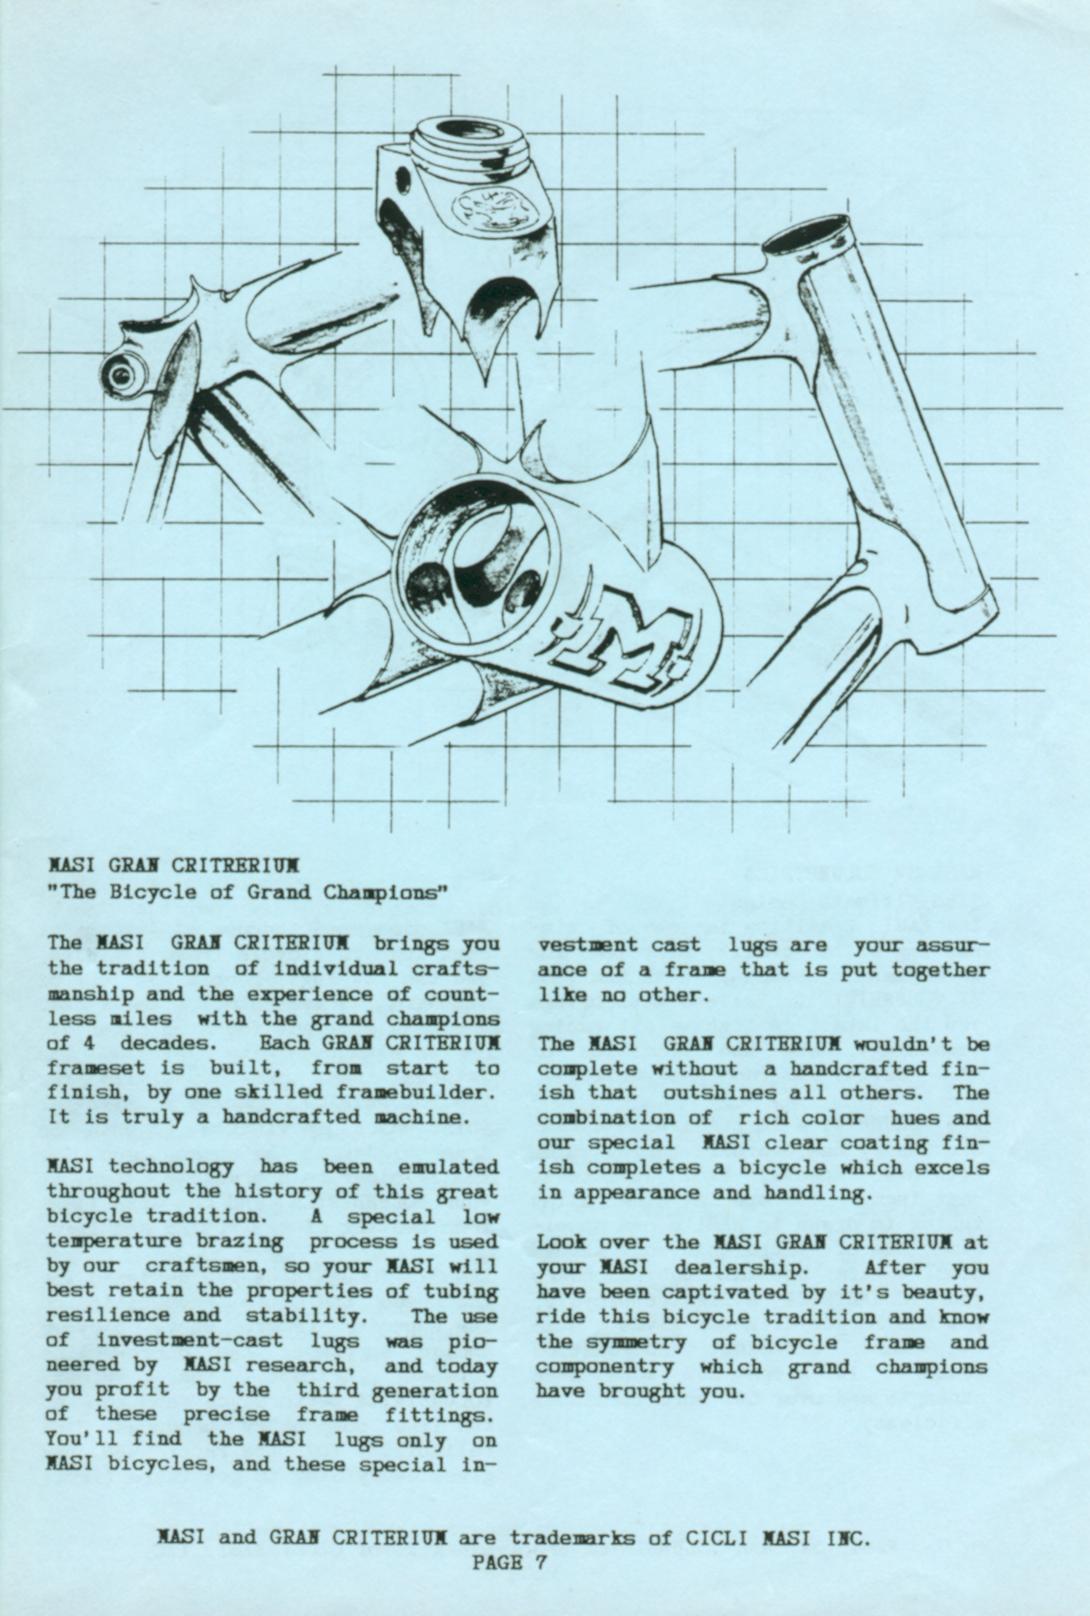 ebykr-cicli-masi-catalog-7